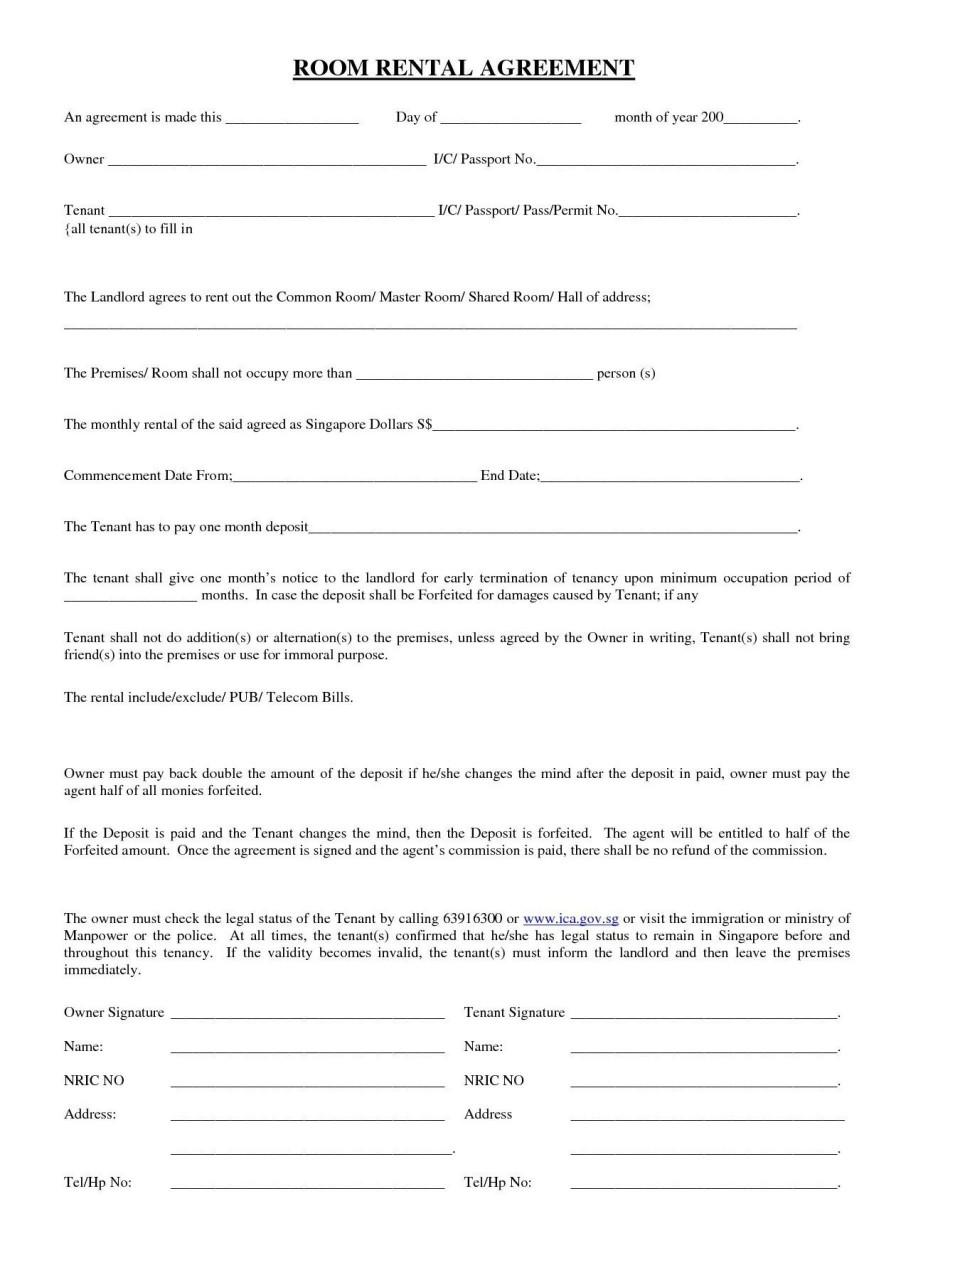 001 Frightening Tenancy Agreement Template Word Free Sample  Uk 2020 Rental Doc Lease960